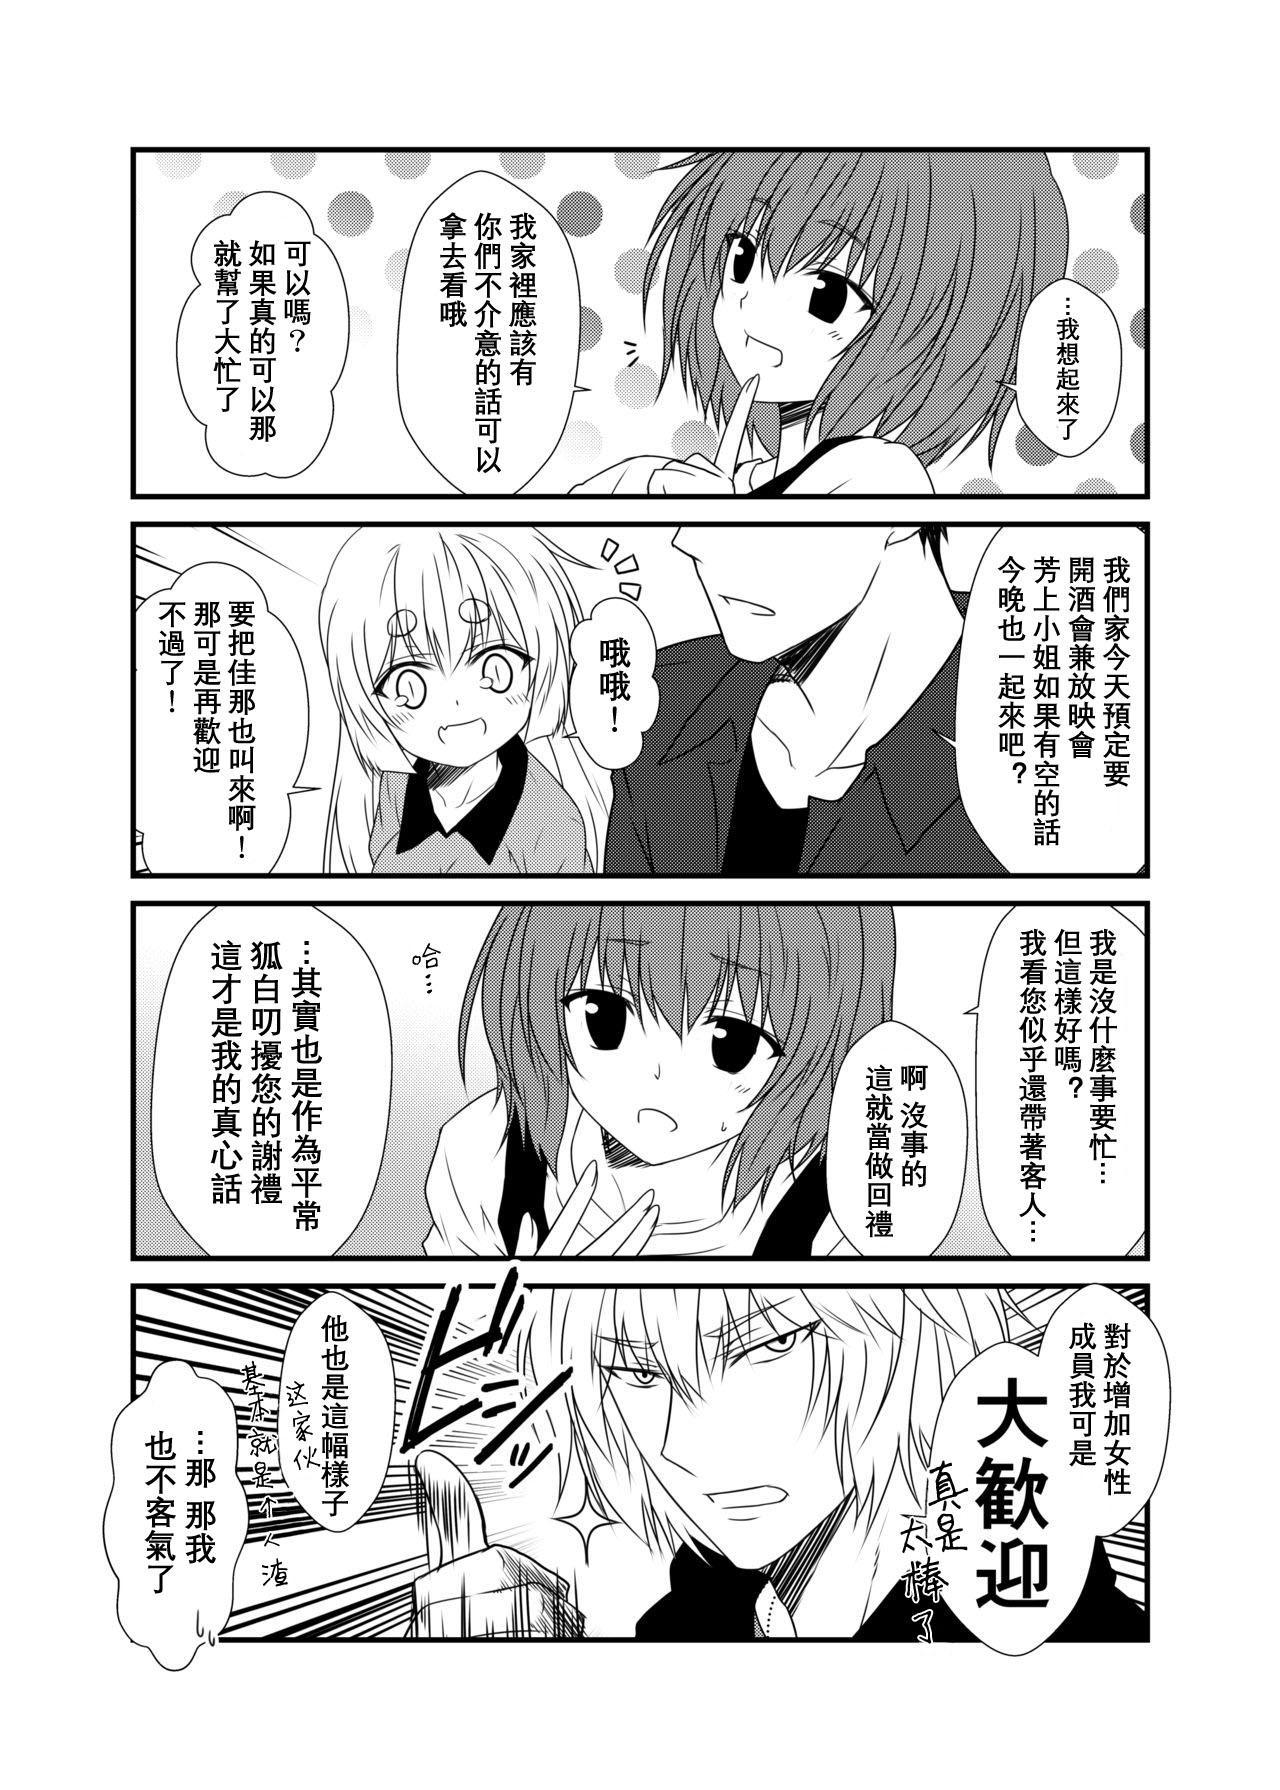 Kohaku Biyori Vol. 5 16